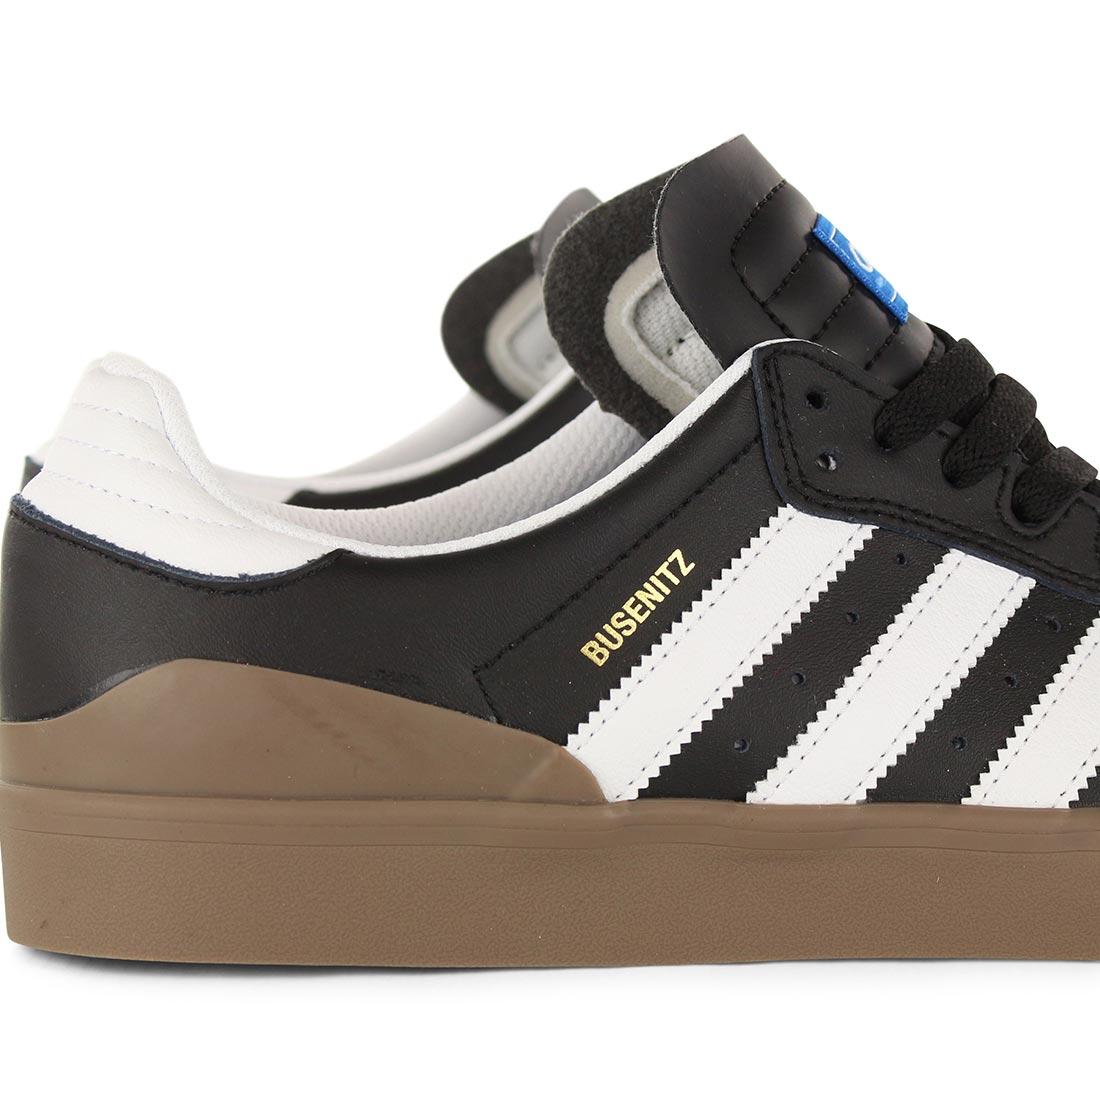 aa1e0e8d6d5c3 Adidas Shoes Busenitz Vulc RX - Black White Gum